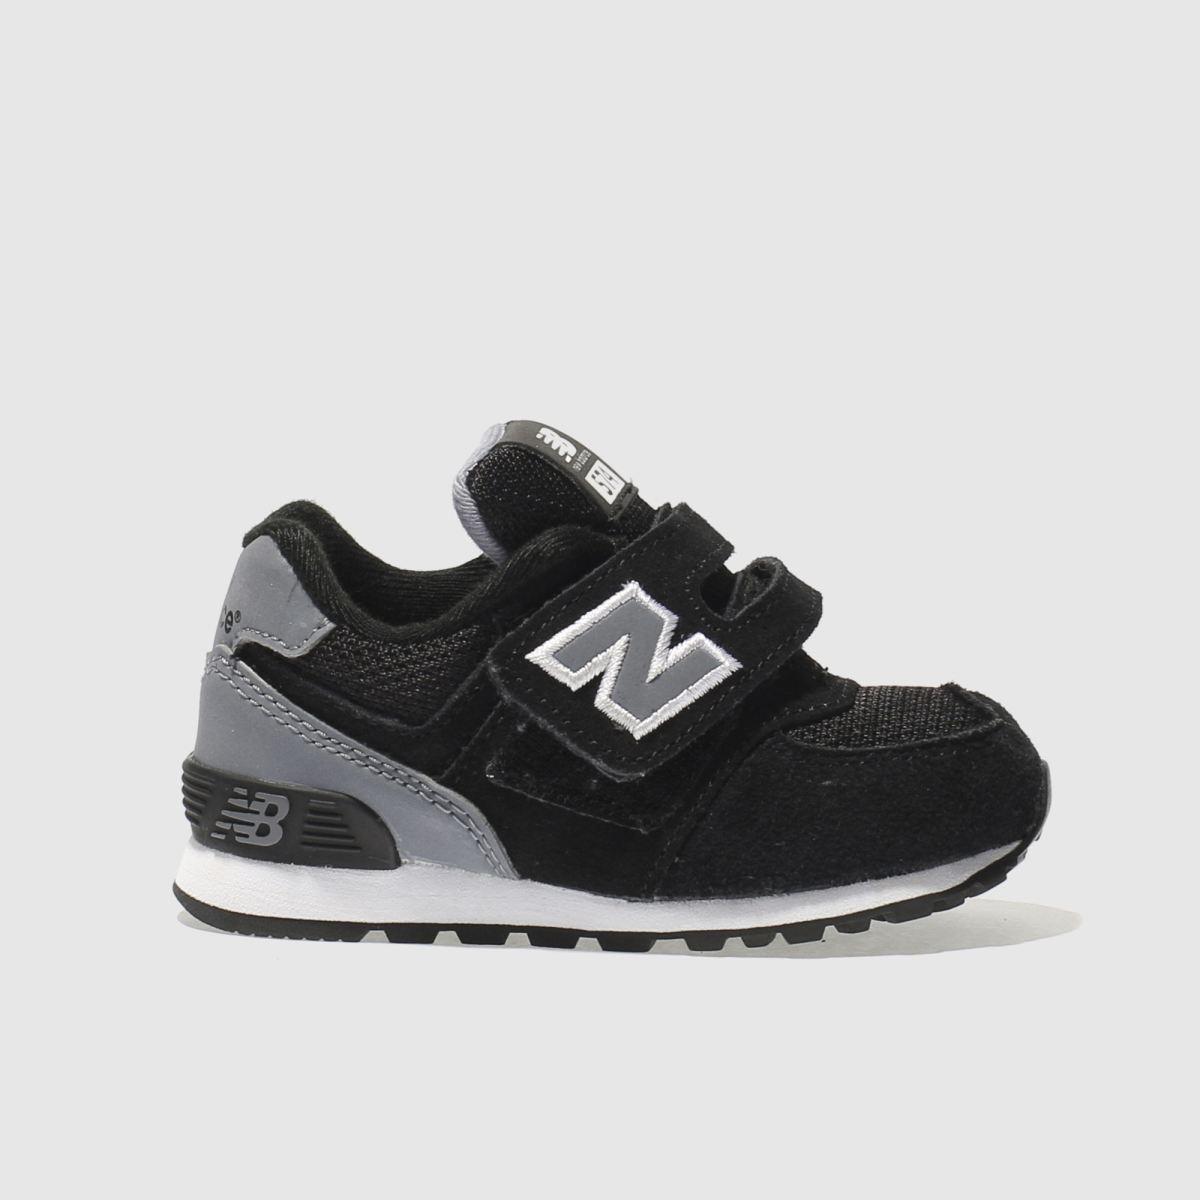 New Balance New Balance Black & Grey 574 Toddler Trainers